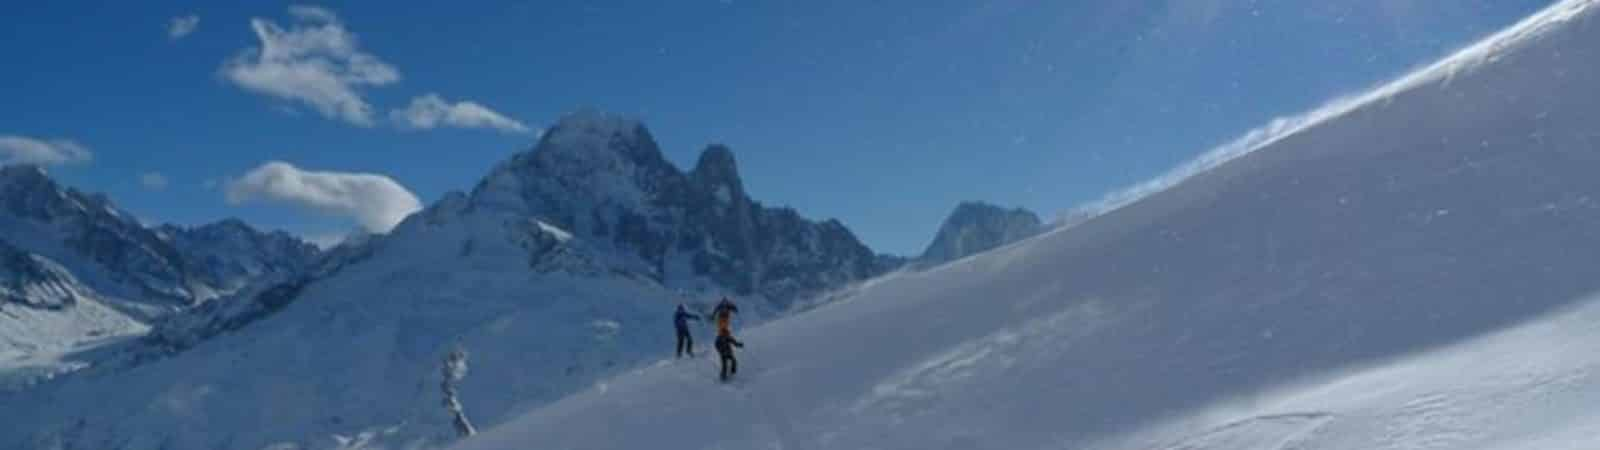 Getting the basics of ski touring in Chamonix